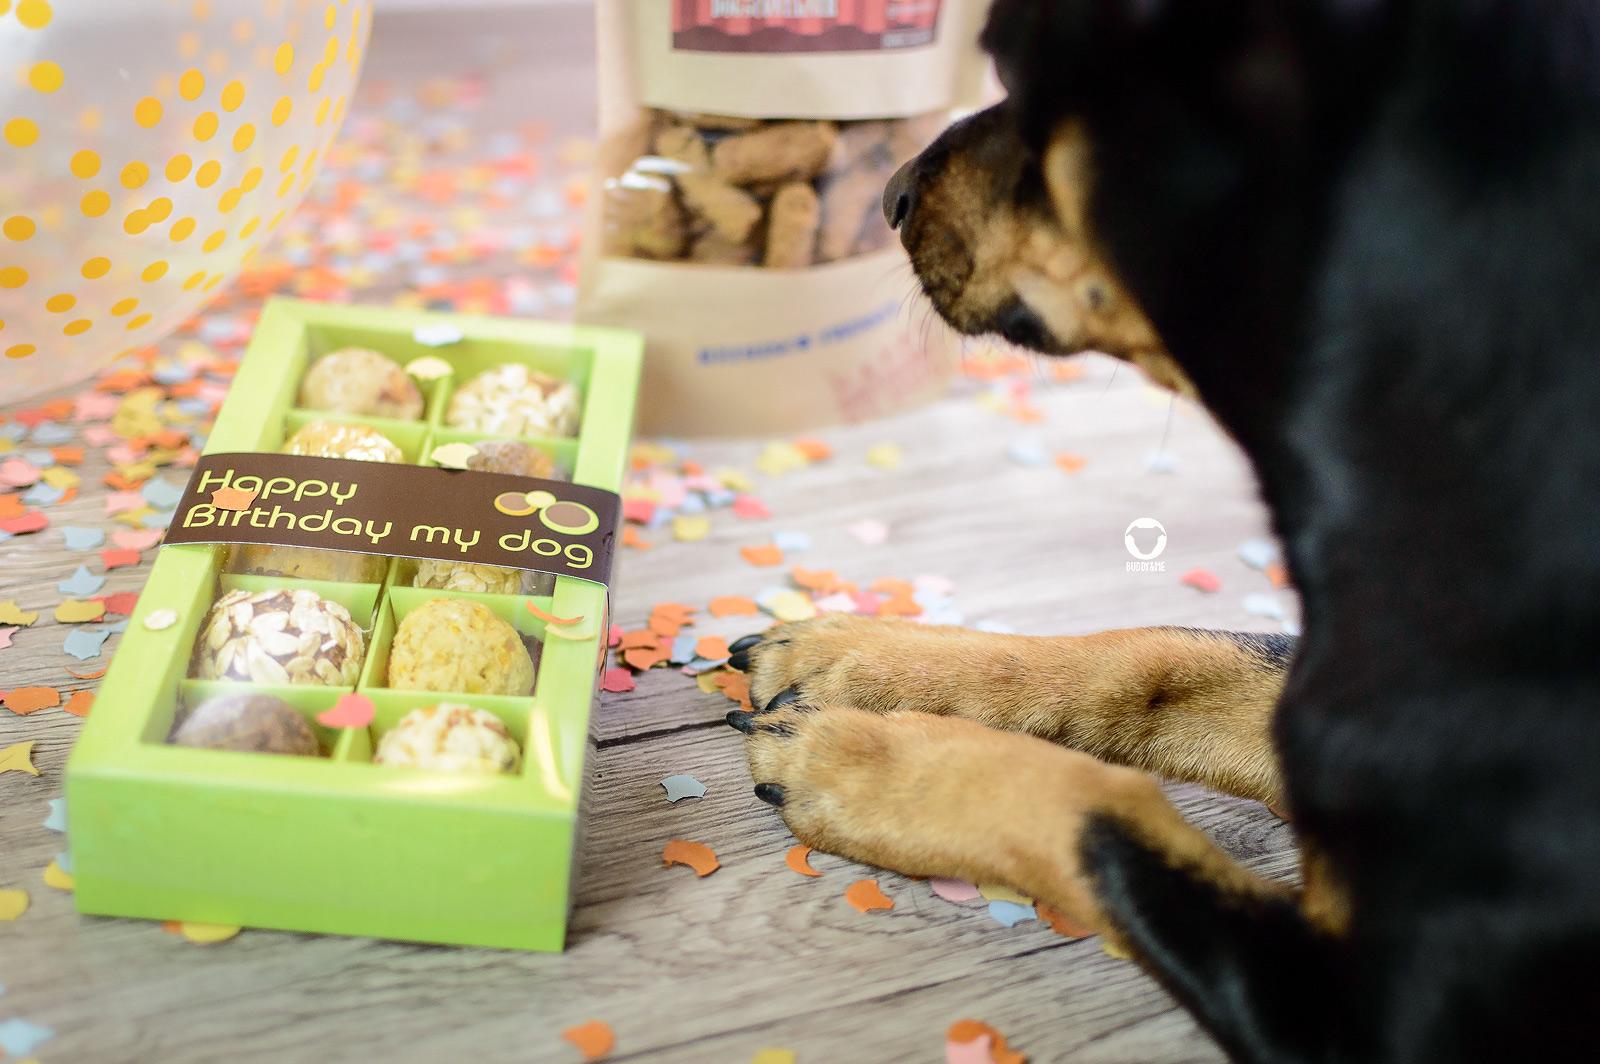 Pinscher Buddy, Buddy and Me, Dogblog, Hundeblog, Geburtstag, Hundegeburtstag, fünf Jahre, Pinscher, Zwergpinscher, Ruhrgebiet, feiern, Happy Birthday, Hamburger Kugeln